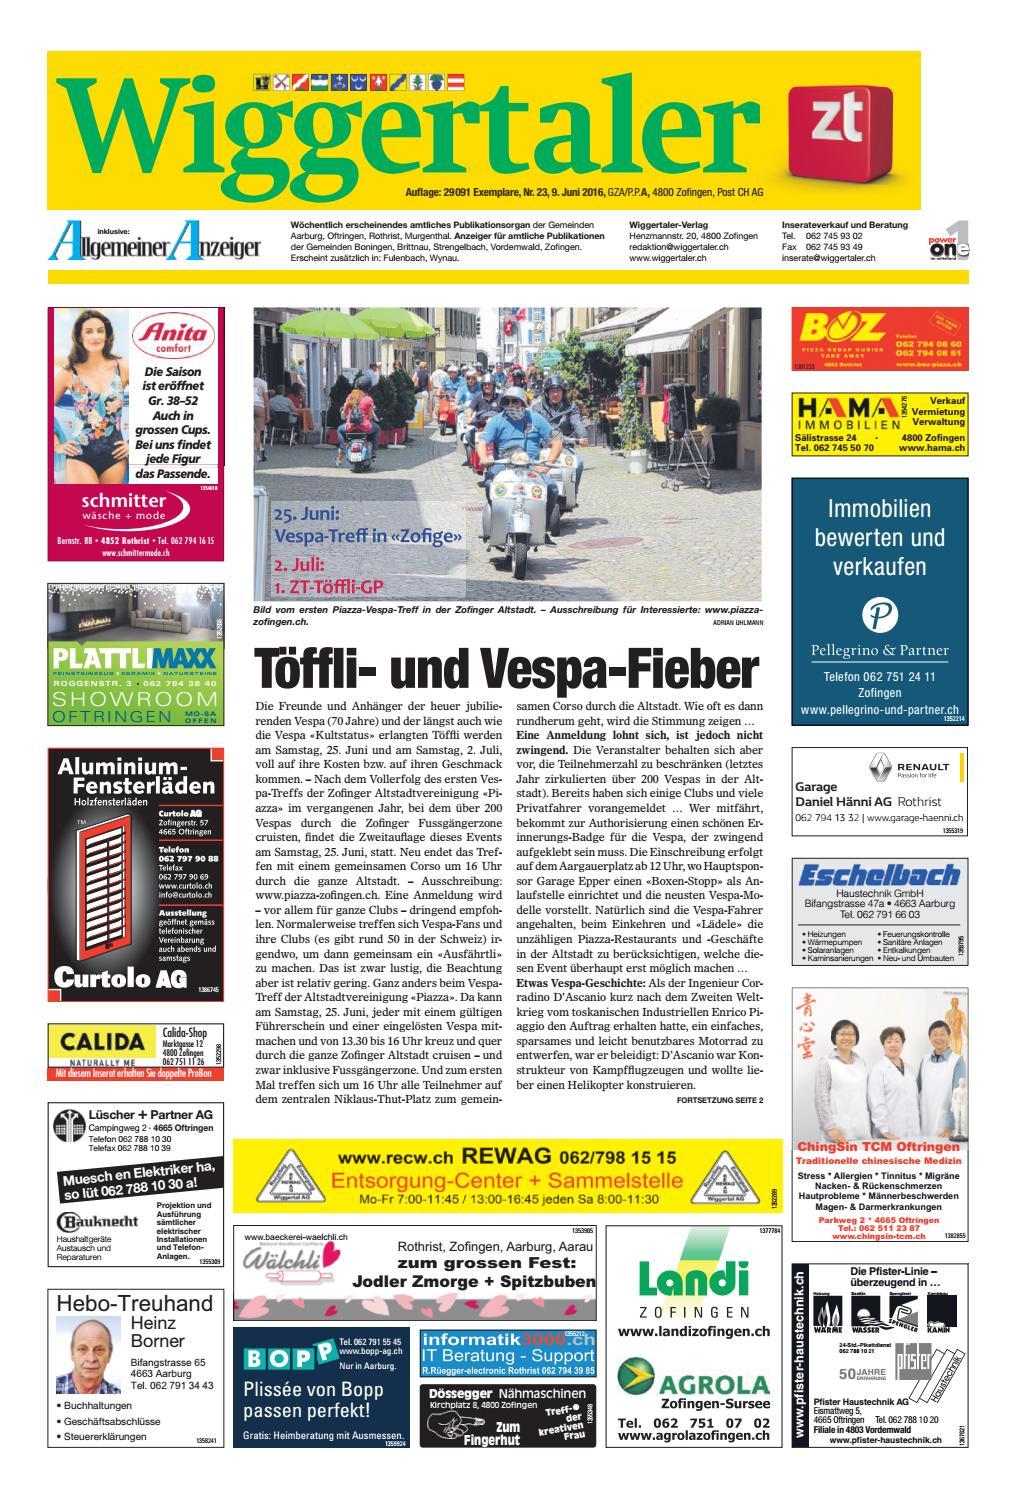 Perfekt Wiggertaler 23/16 By ZT Medien AG   Issuu